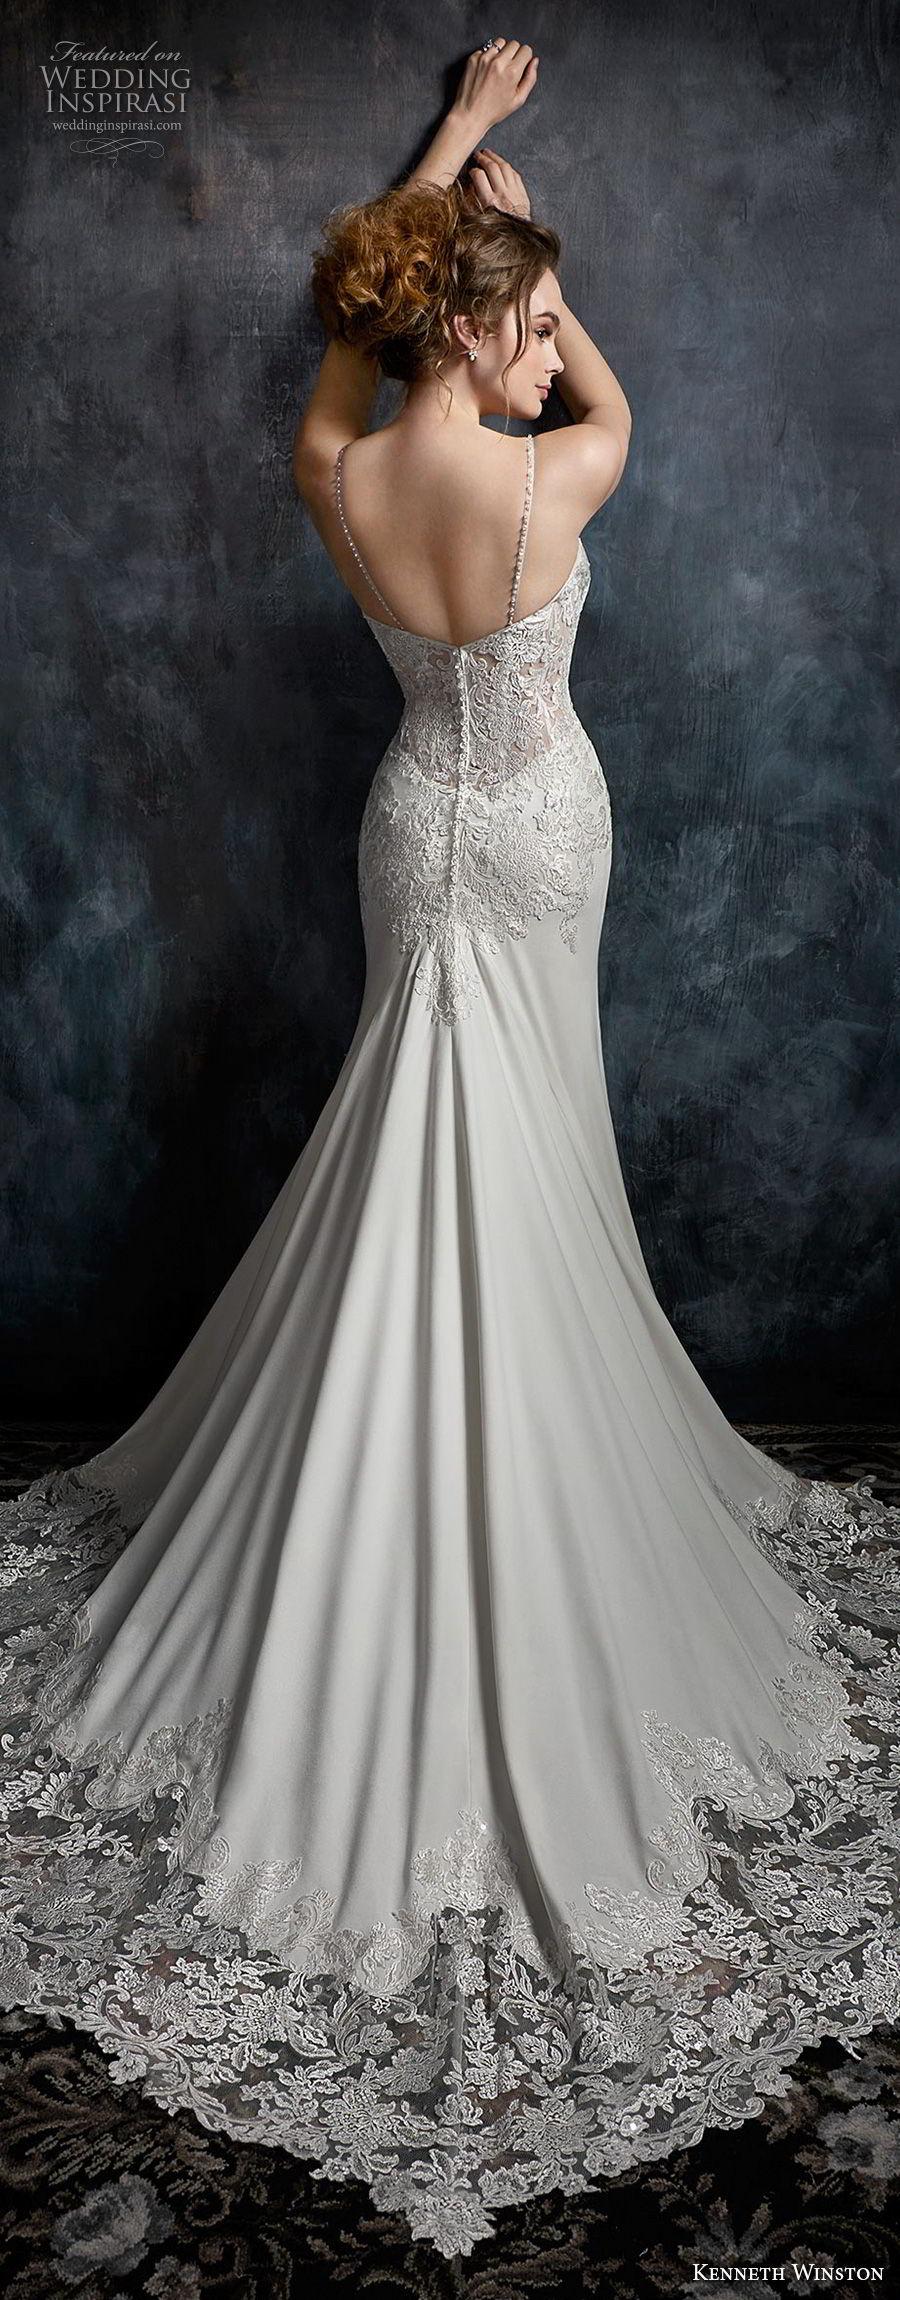 kenneth winston fall 2017 bridal spaghetti strap sweetheart neckline heavily embellished bodice elegant sheath wedding dress chapel train (29) bv